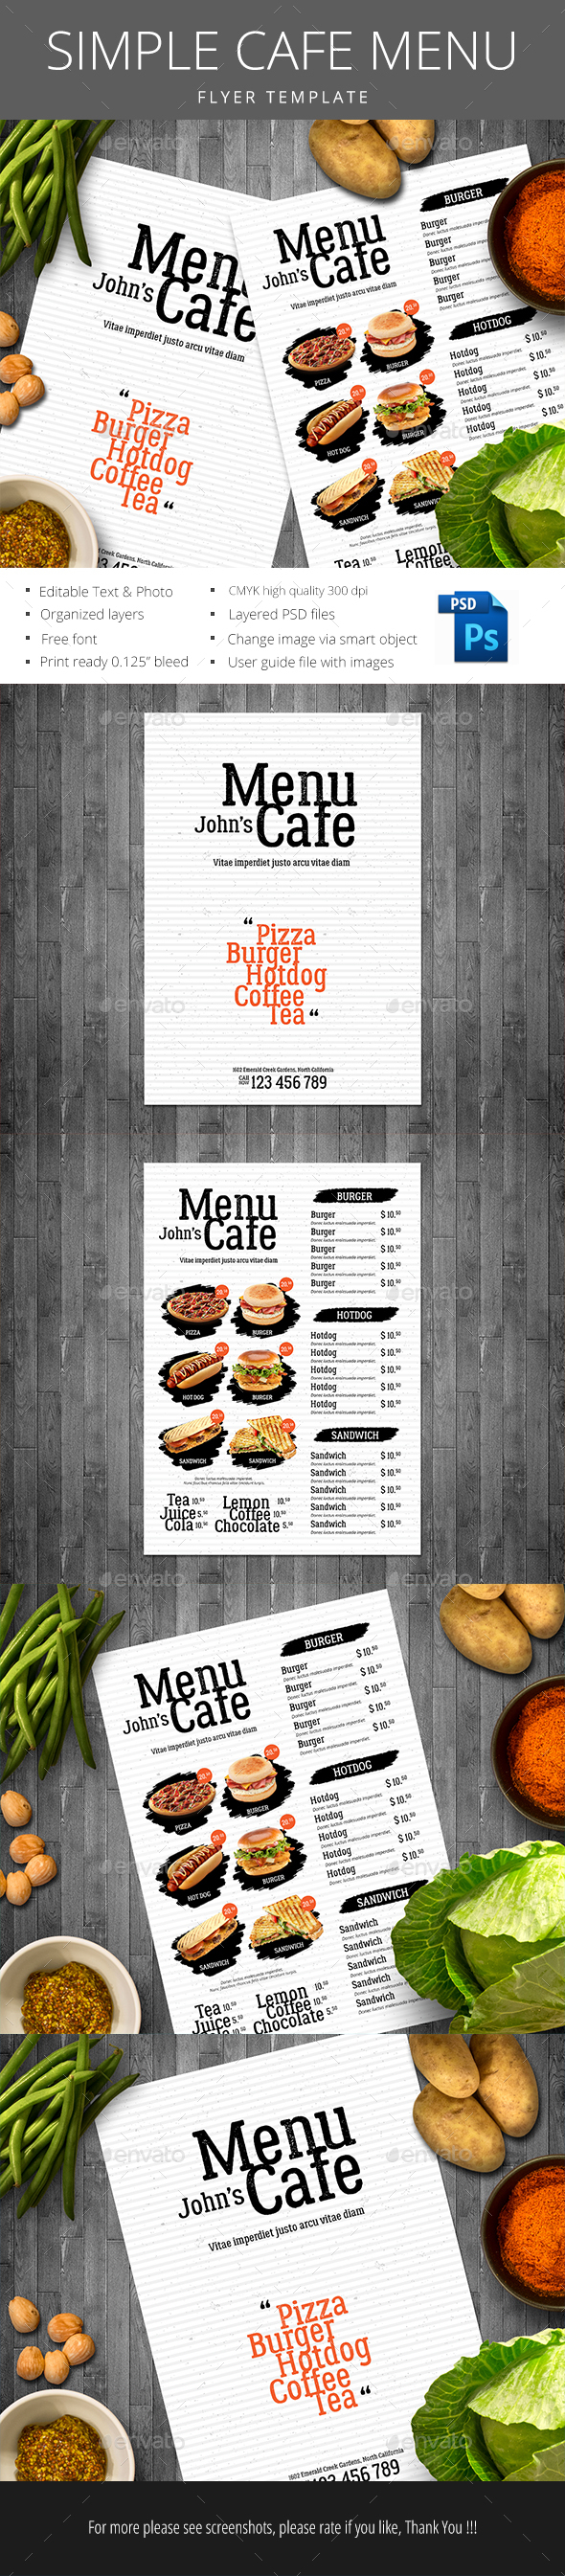 Simple Cafe Menu - Restaurant Flyers